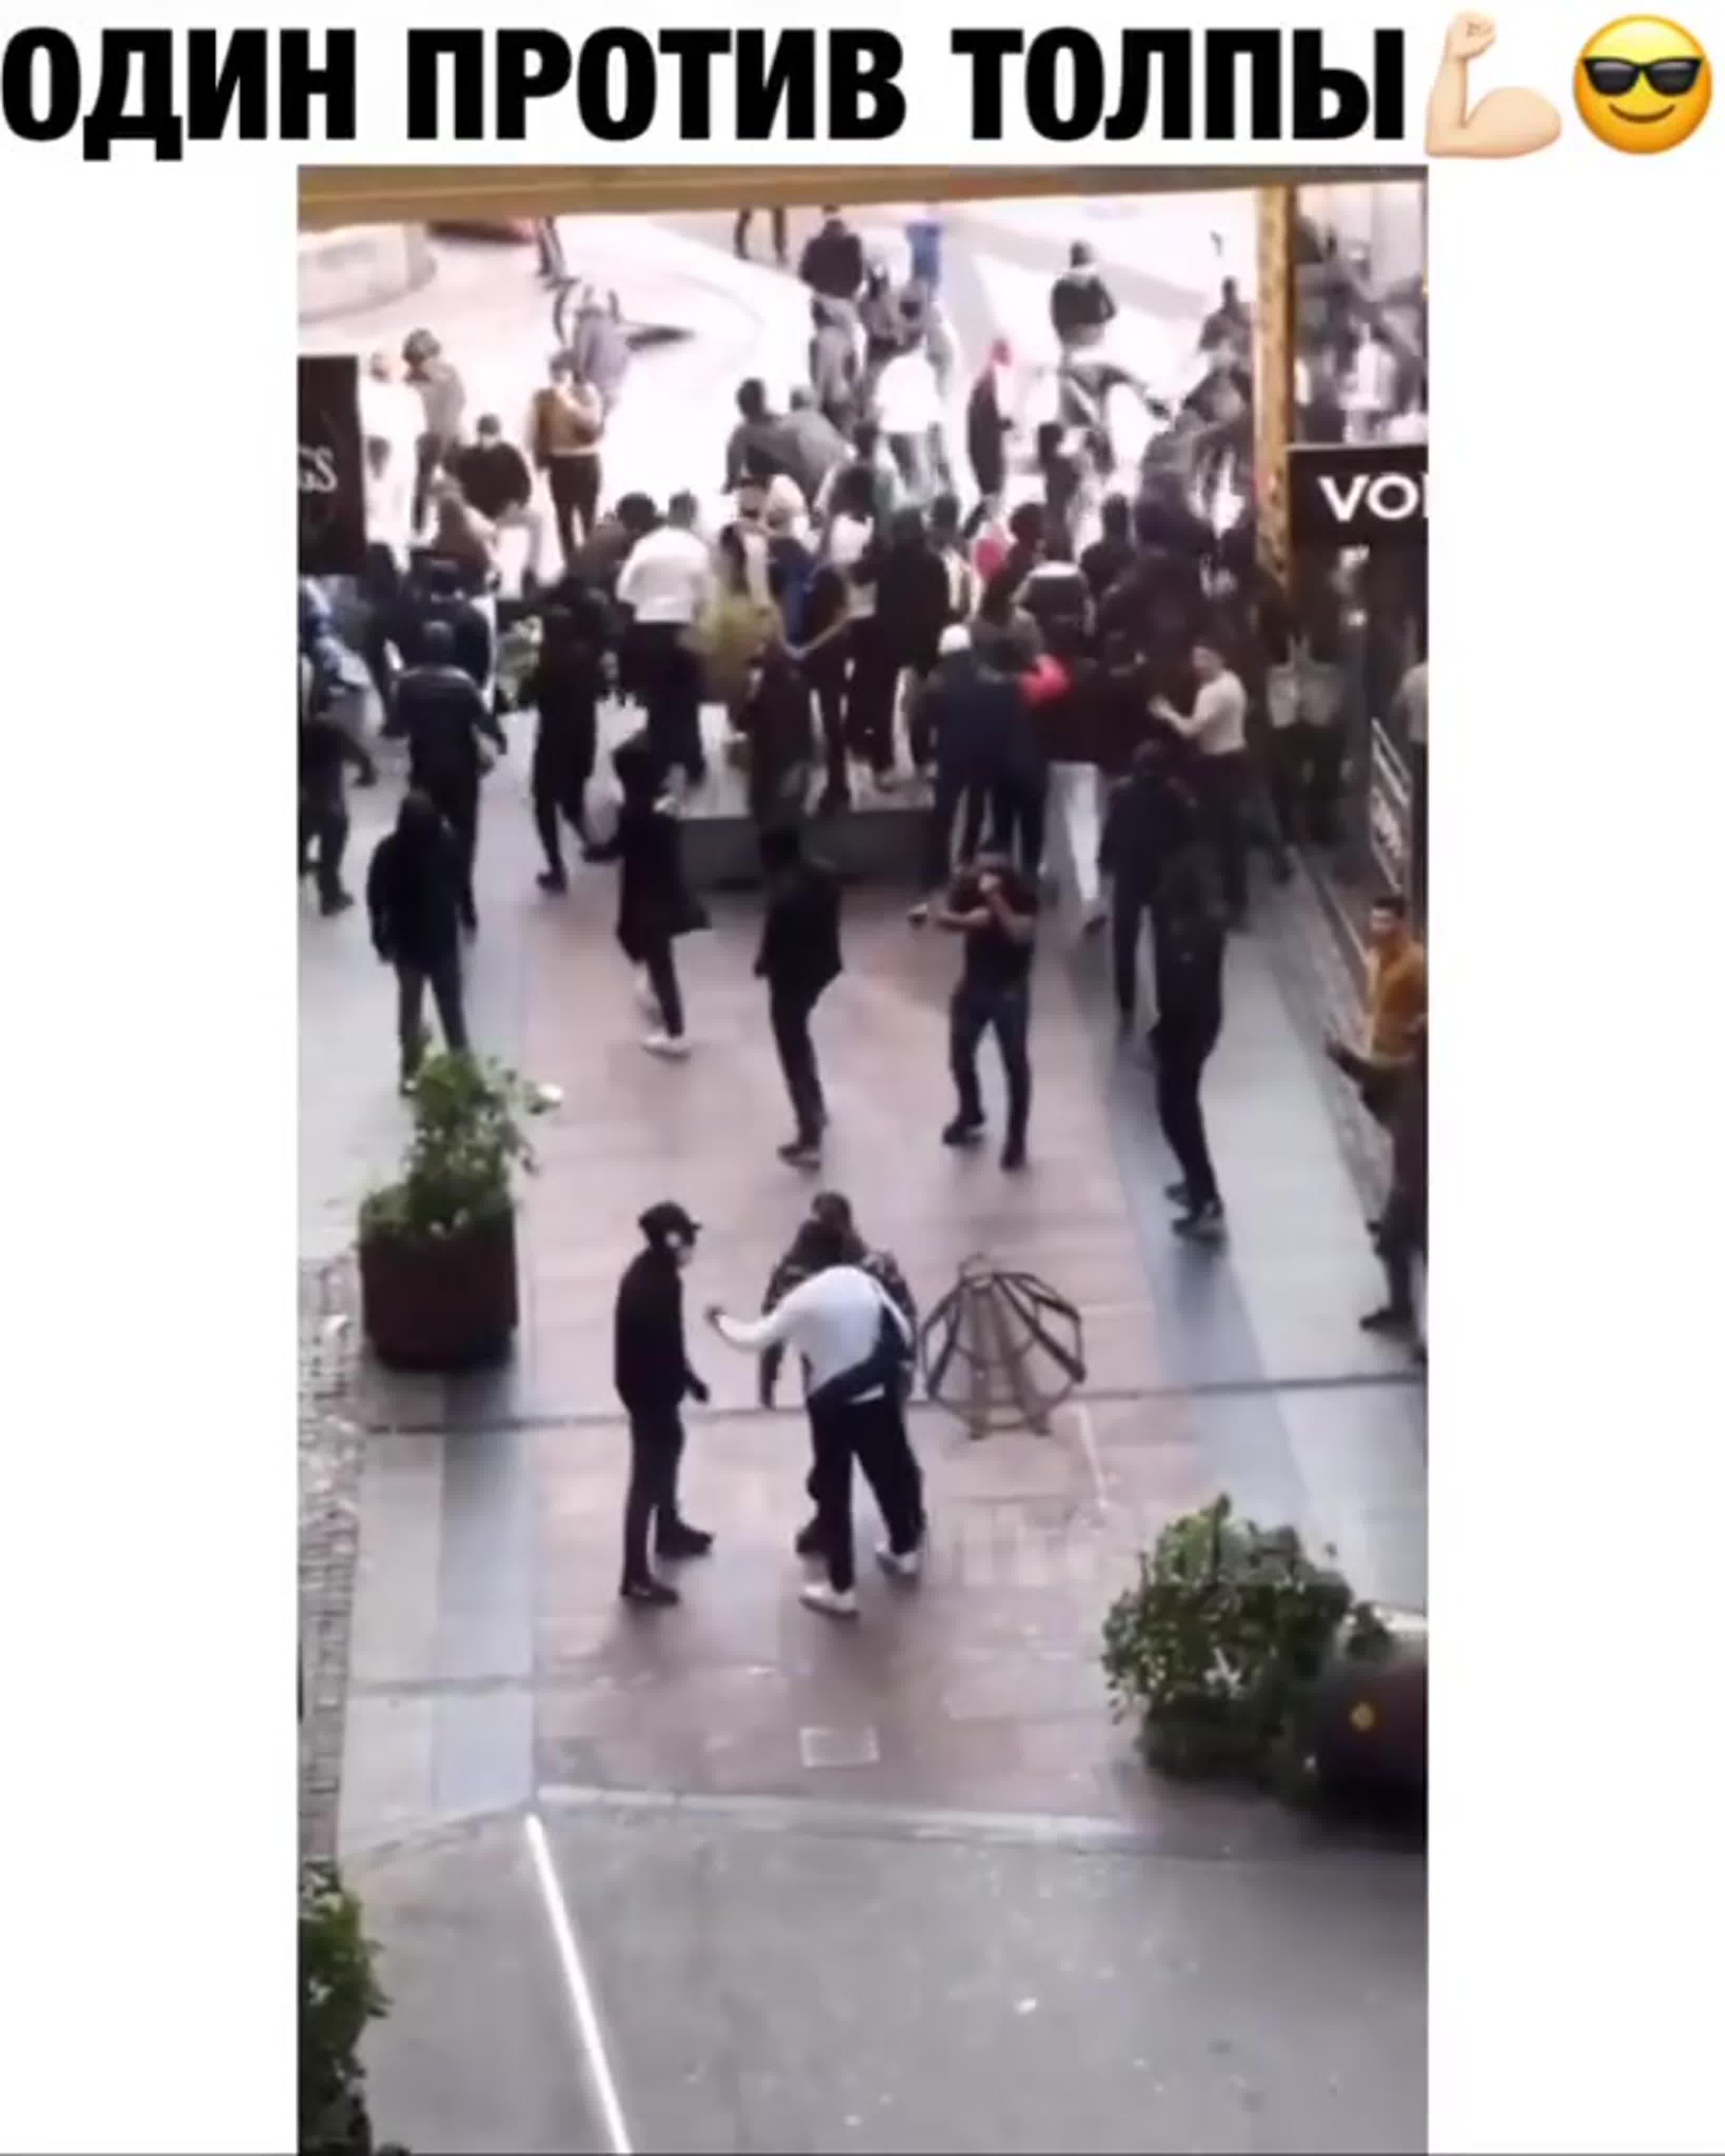 толпу улице